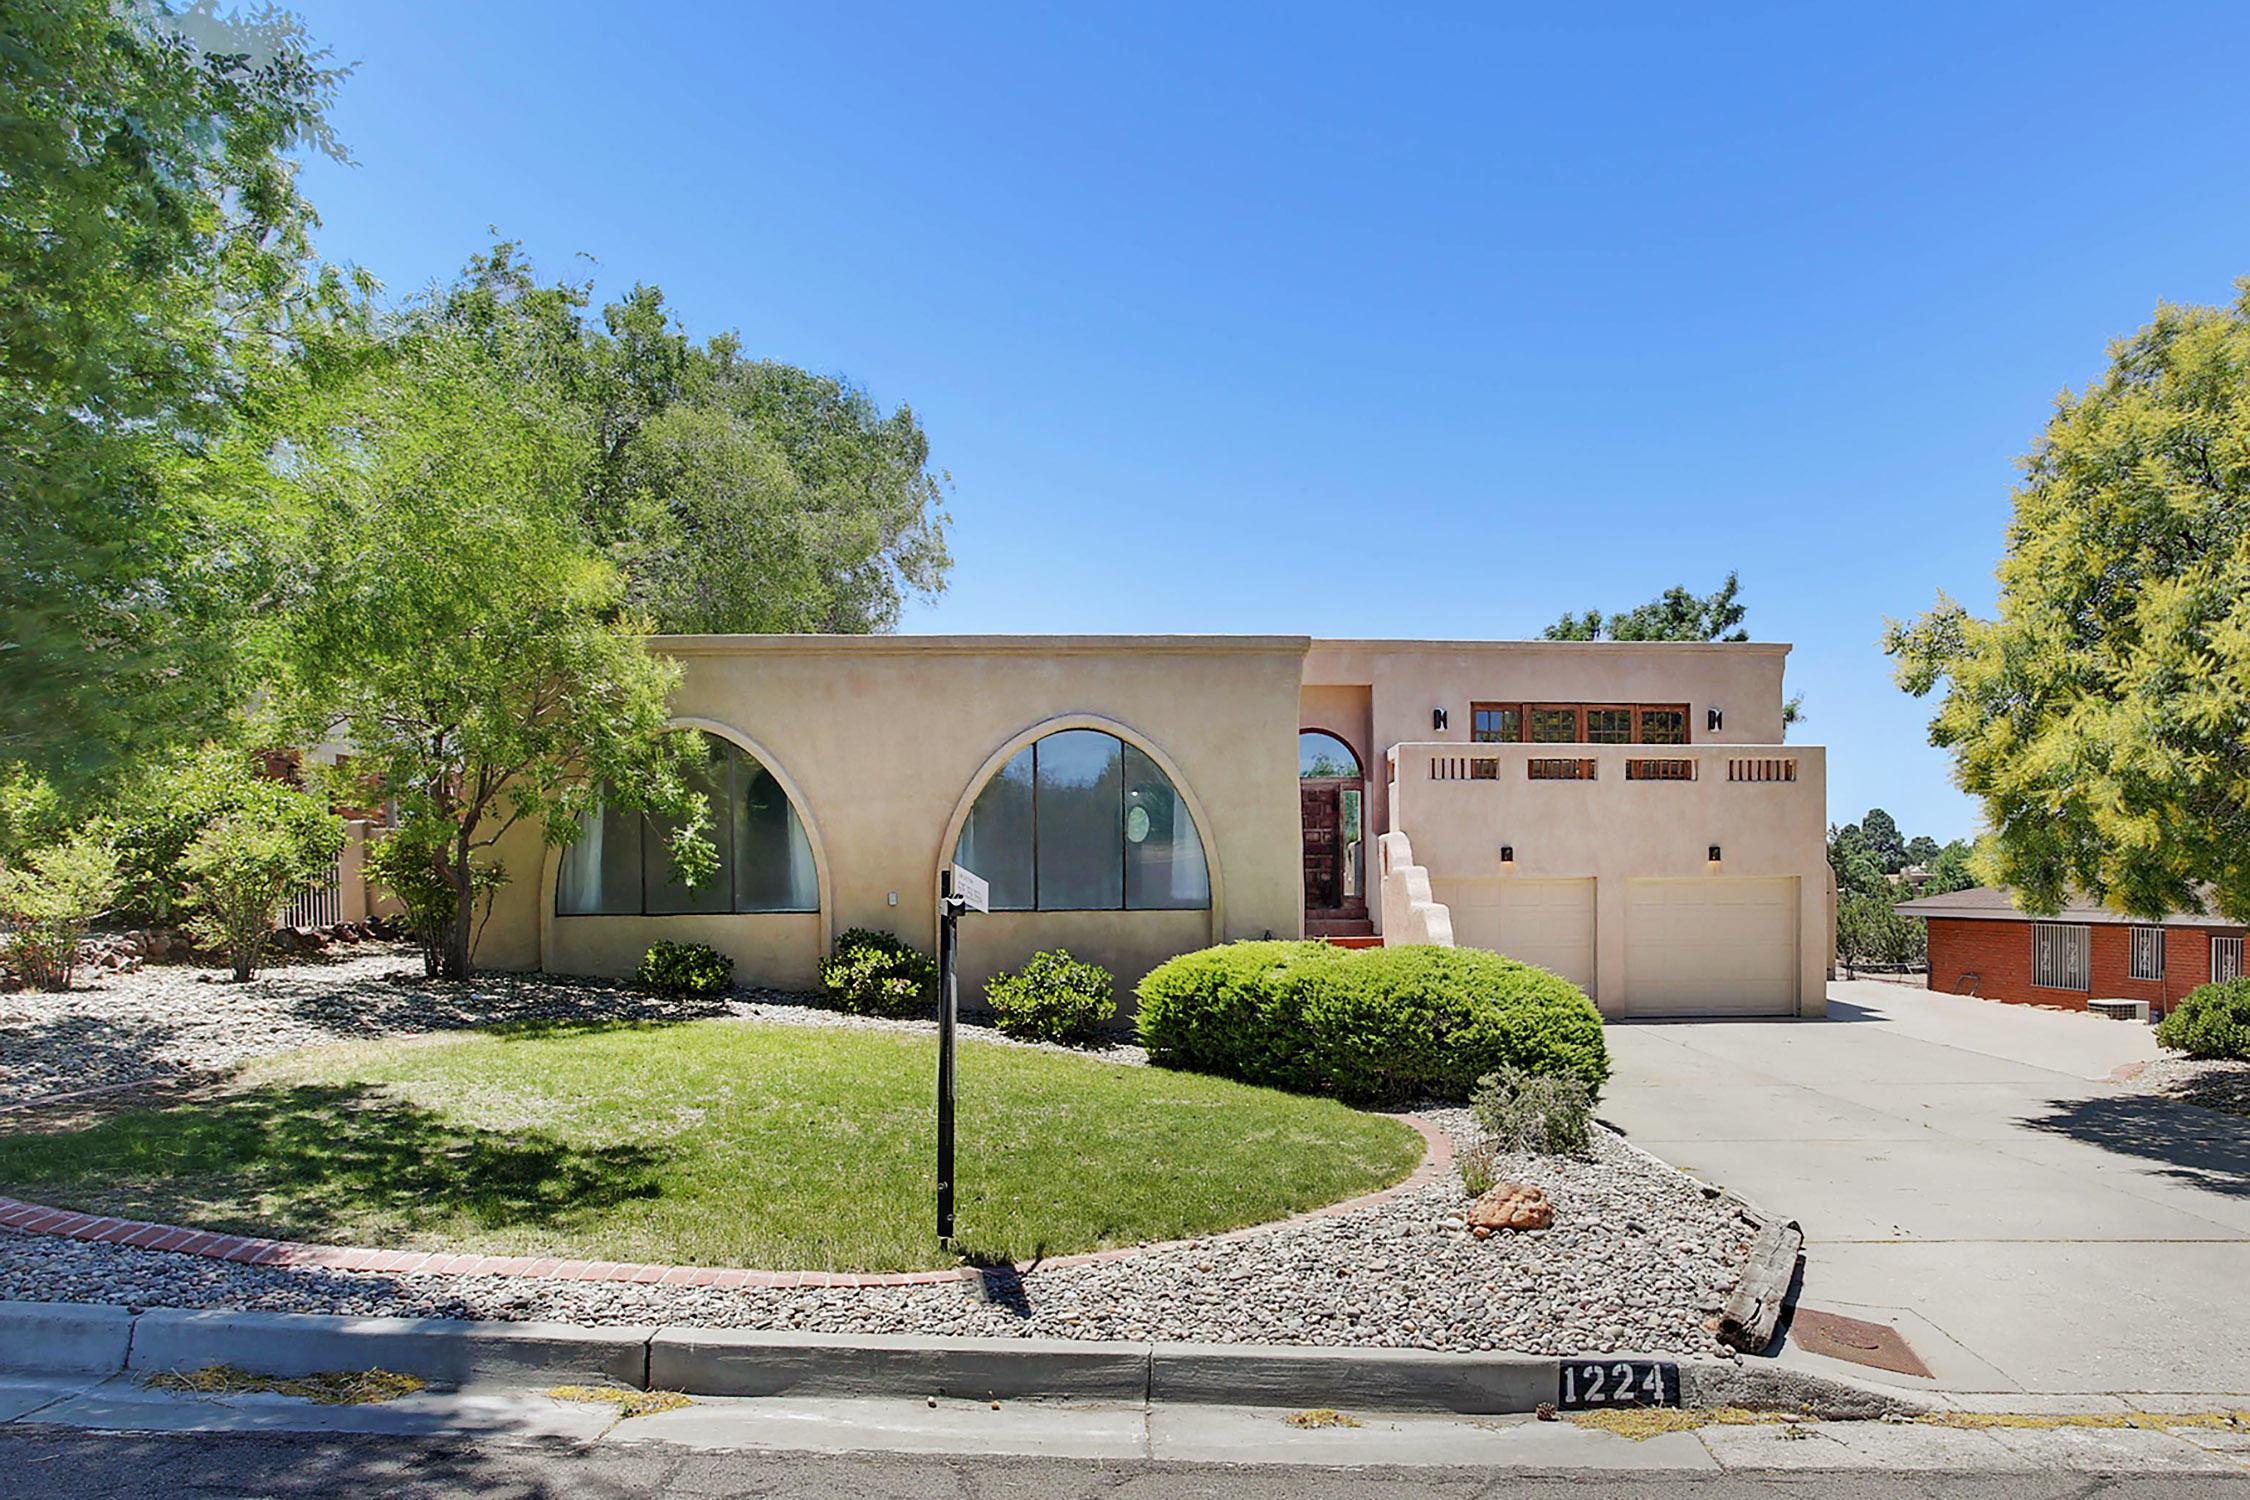 1224 Cuatro Cerros Trail SE Property Photo - Albuquerque, NM real estate listing